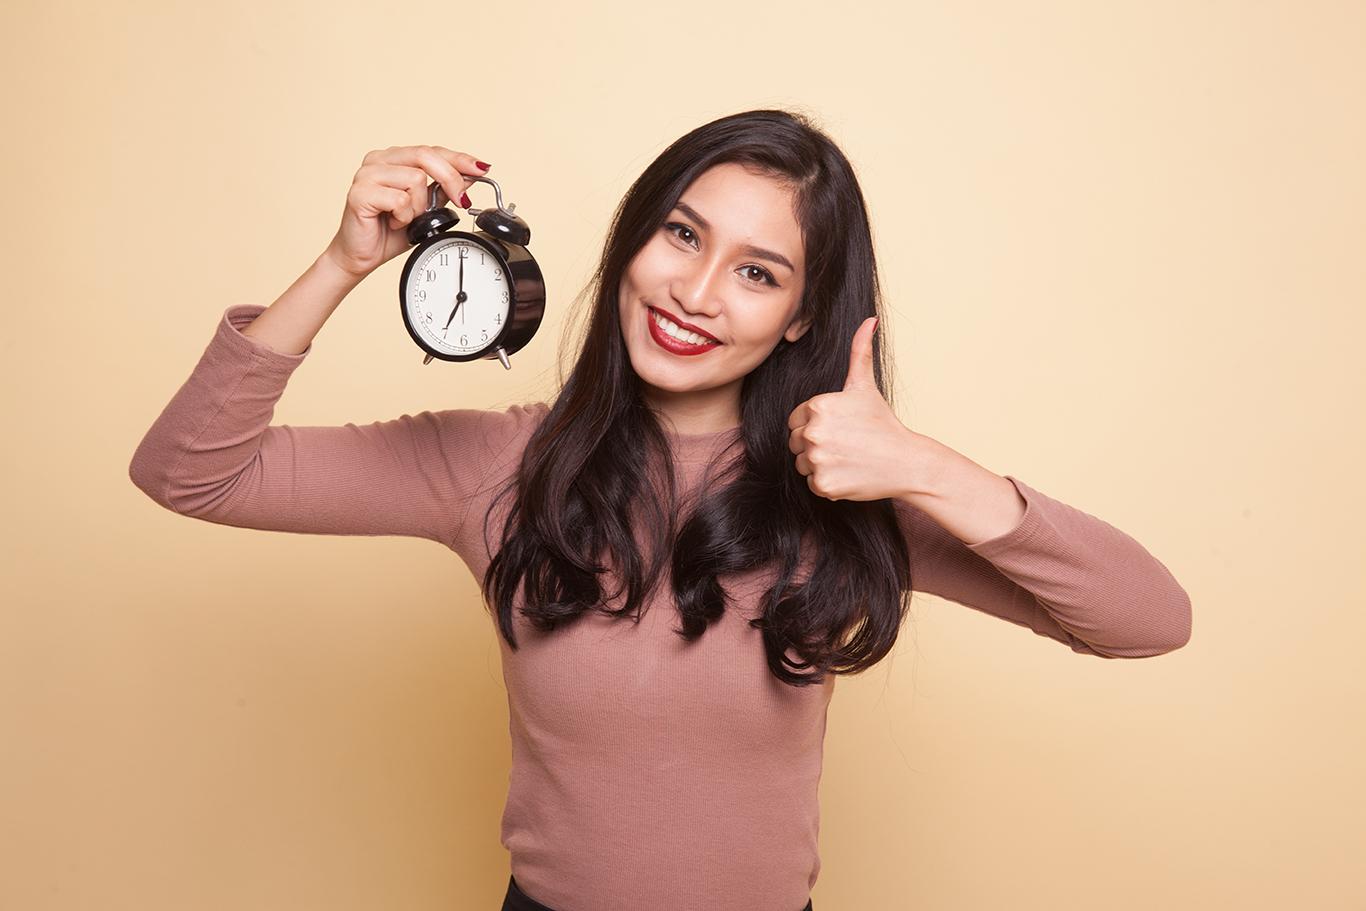 a latina holding a clock and thumb up